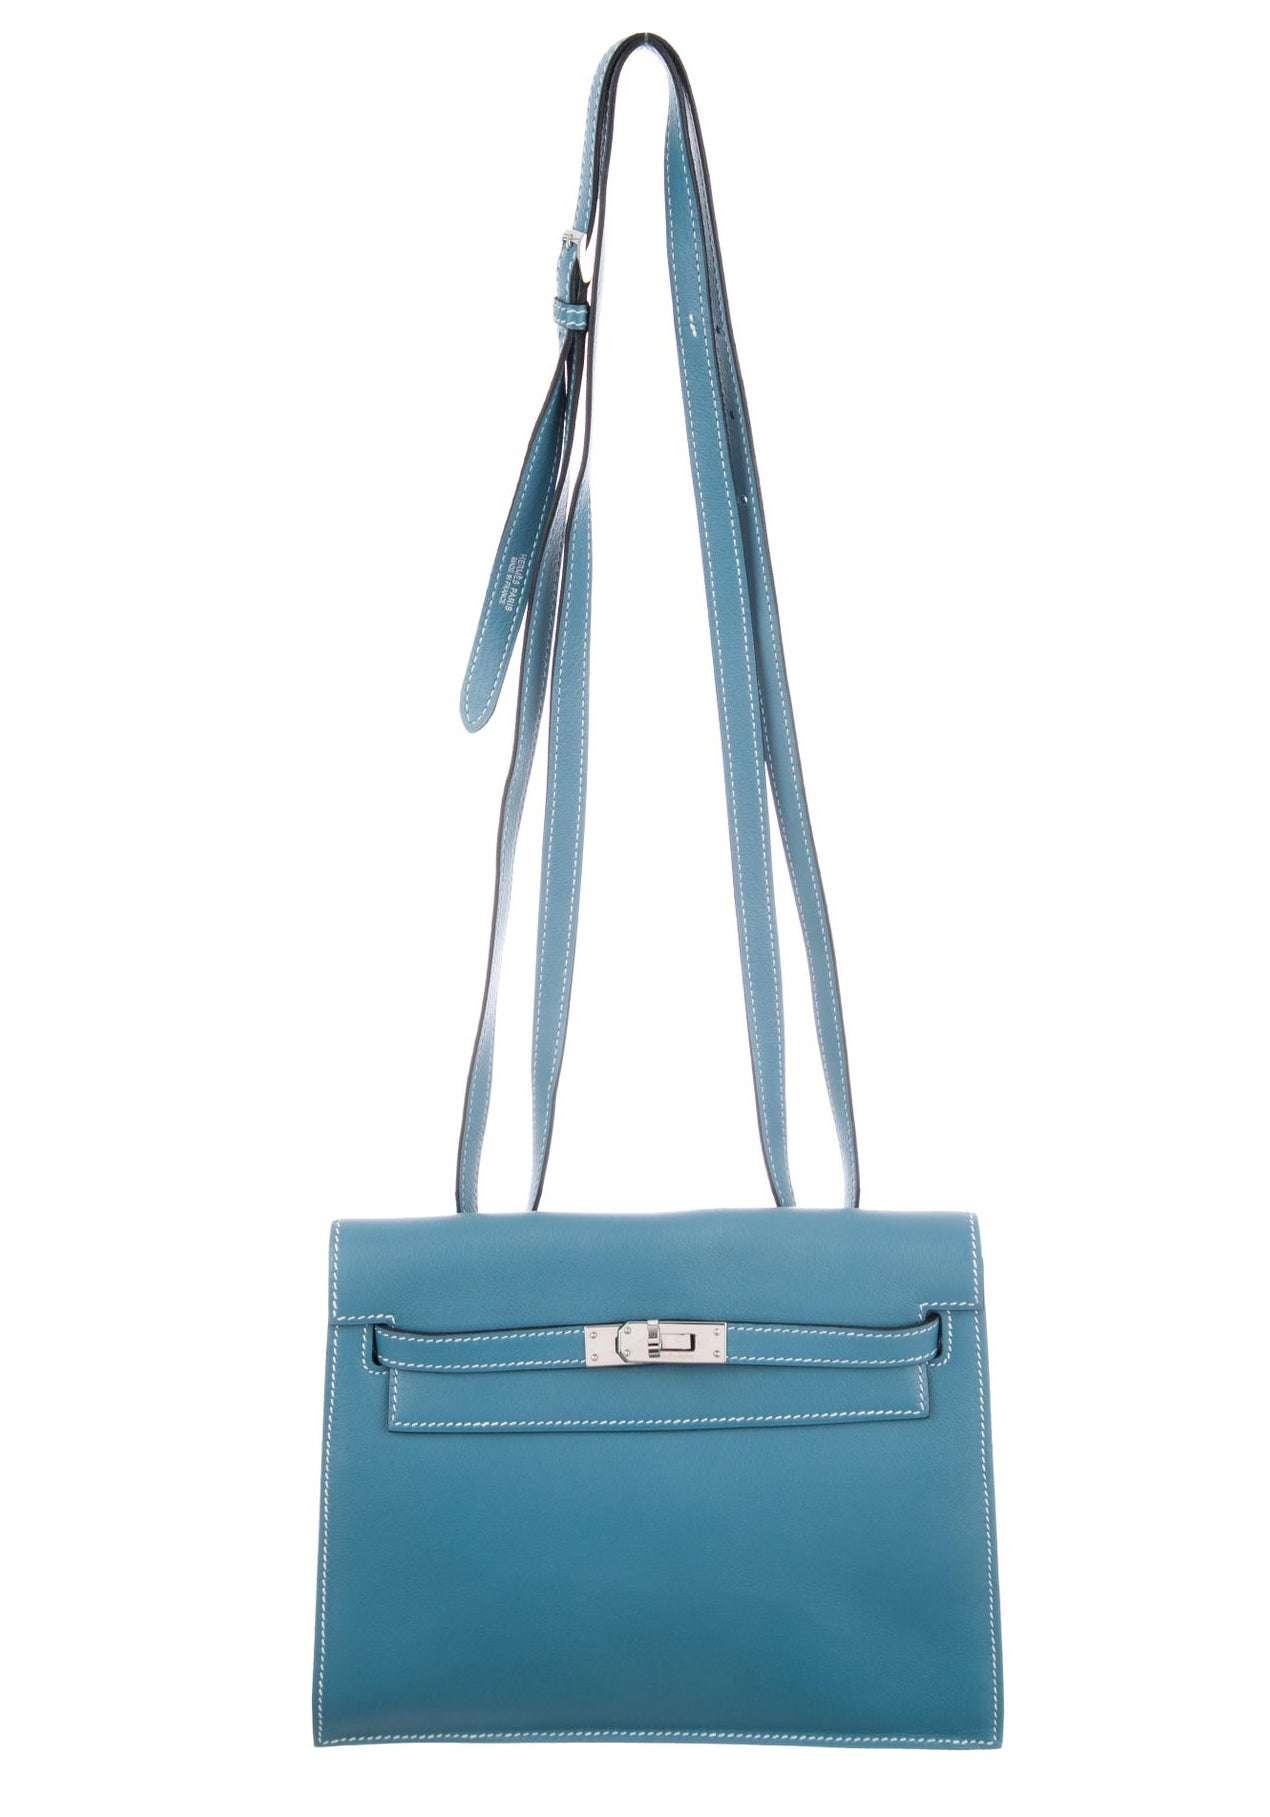 Hermès Swift Kelly Danse Bag